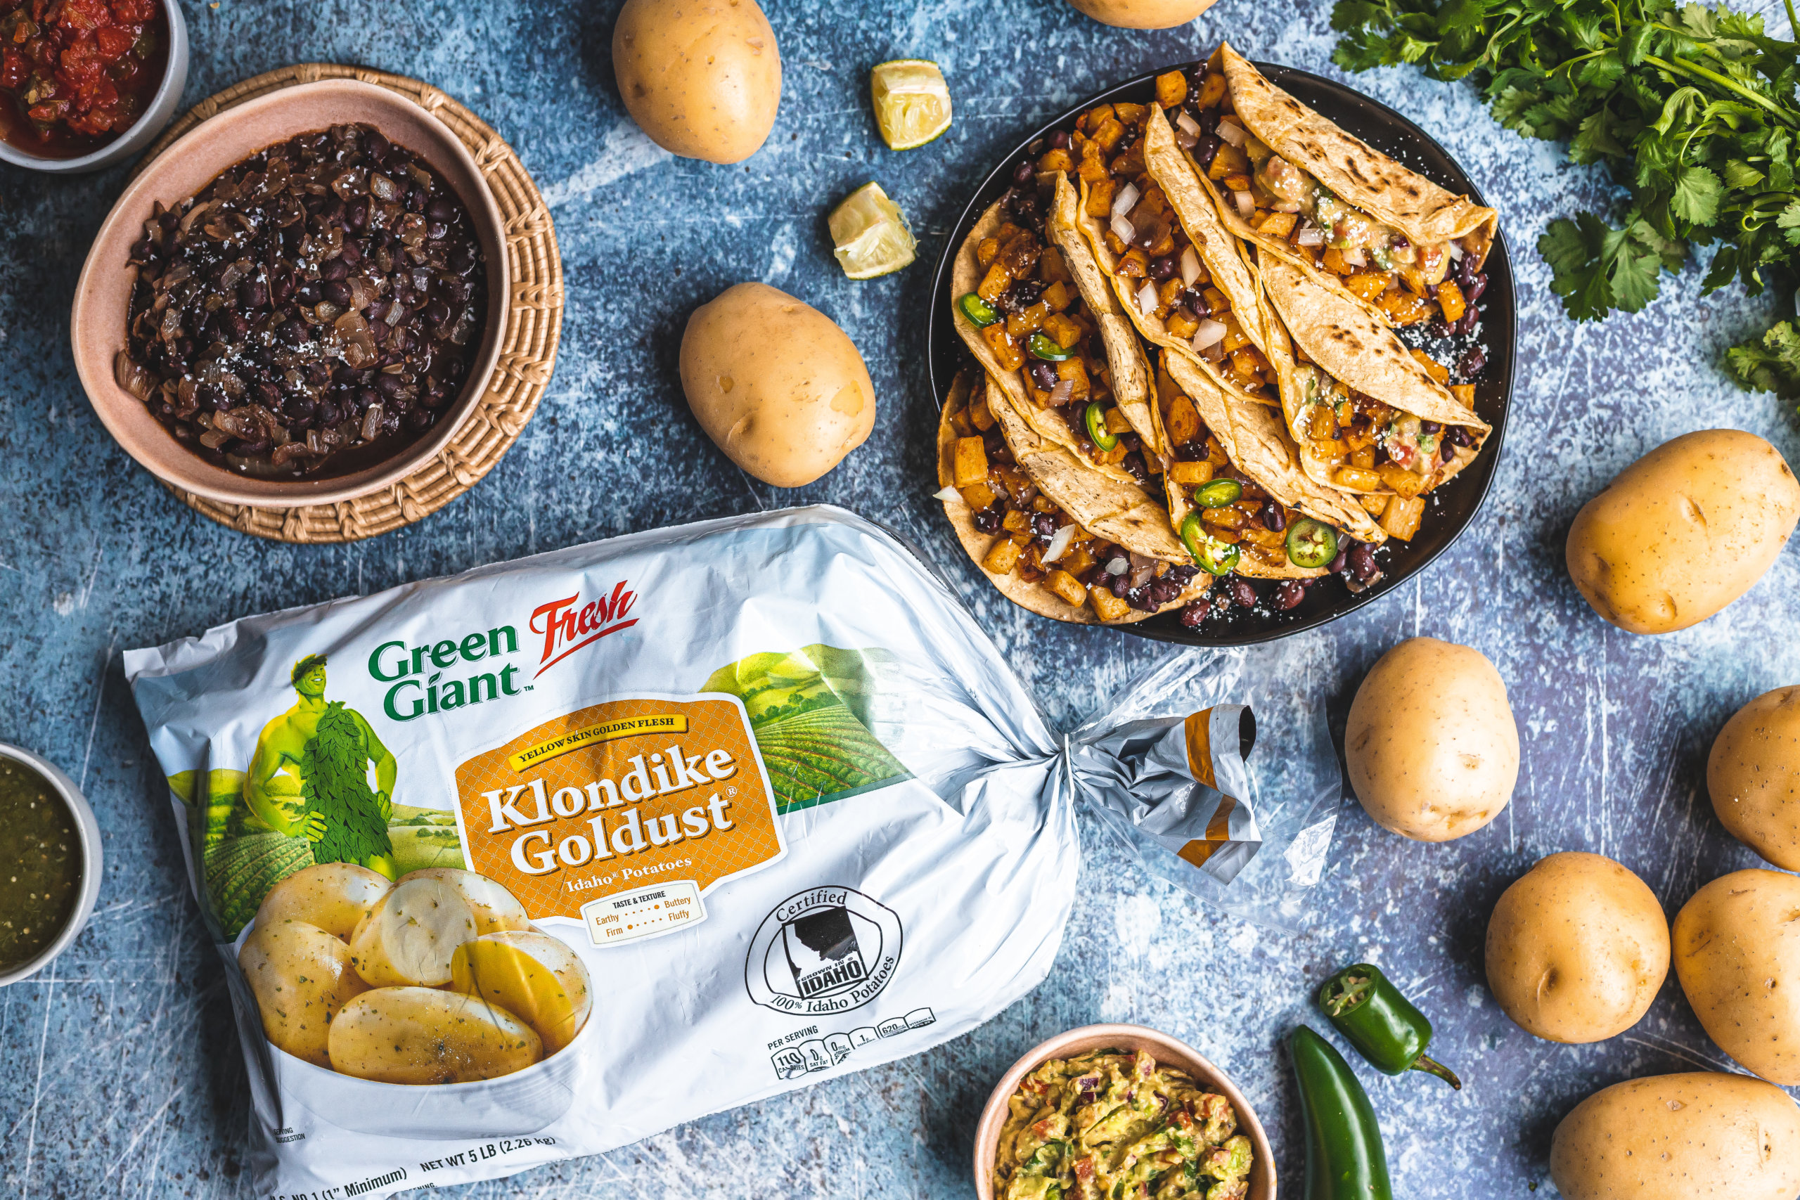 Goldust® Potatoes from Green Giant™ Fresh